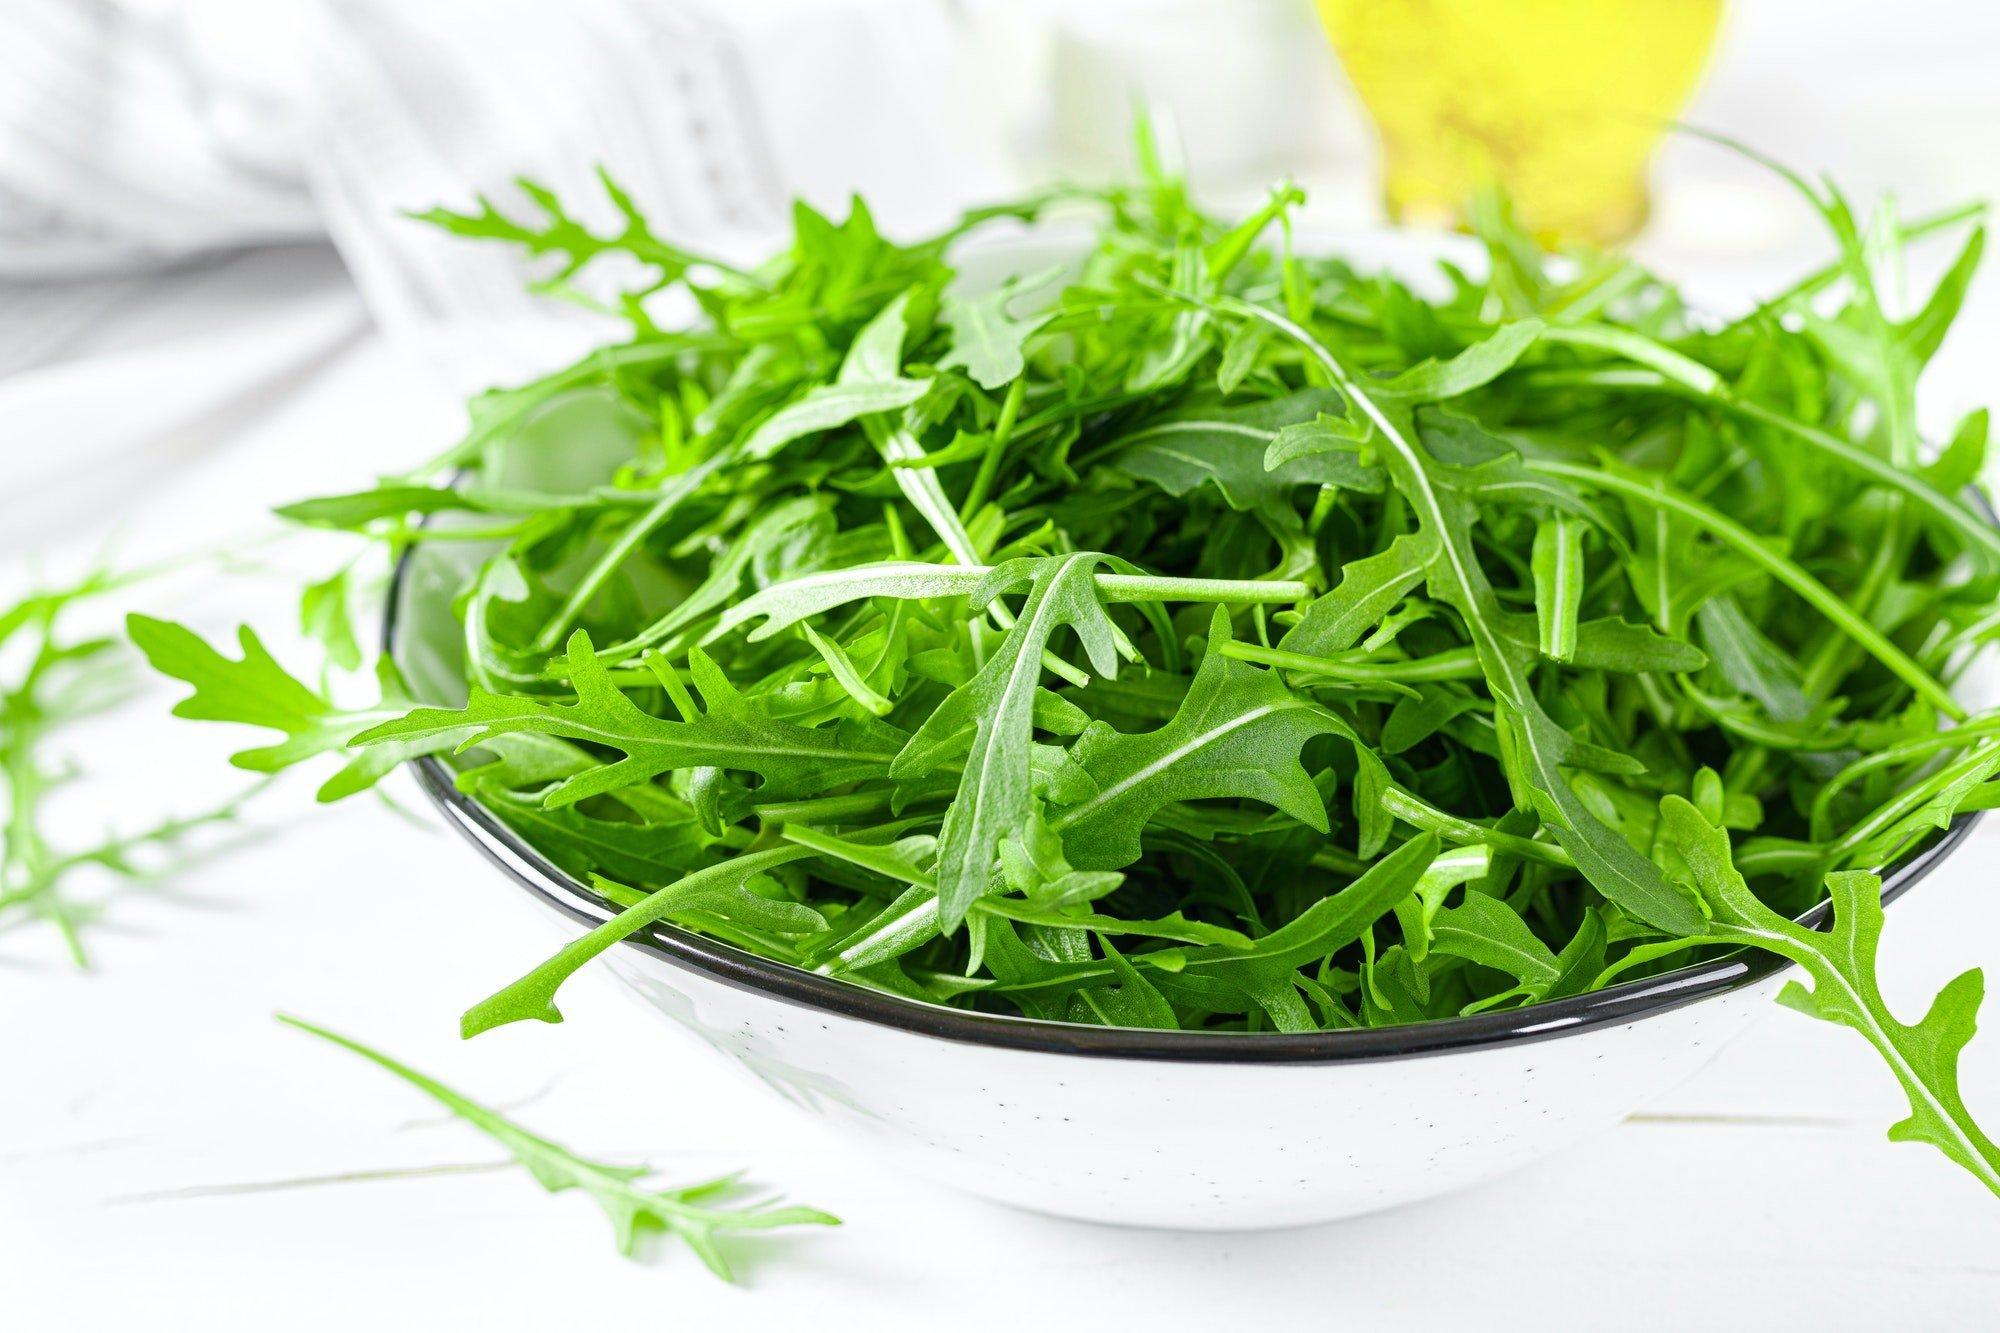 Fresh arugula or rocket leaves salad, rucola